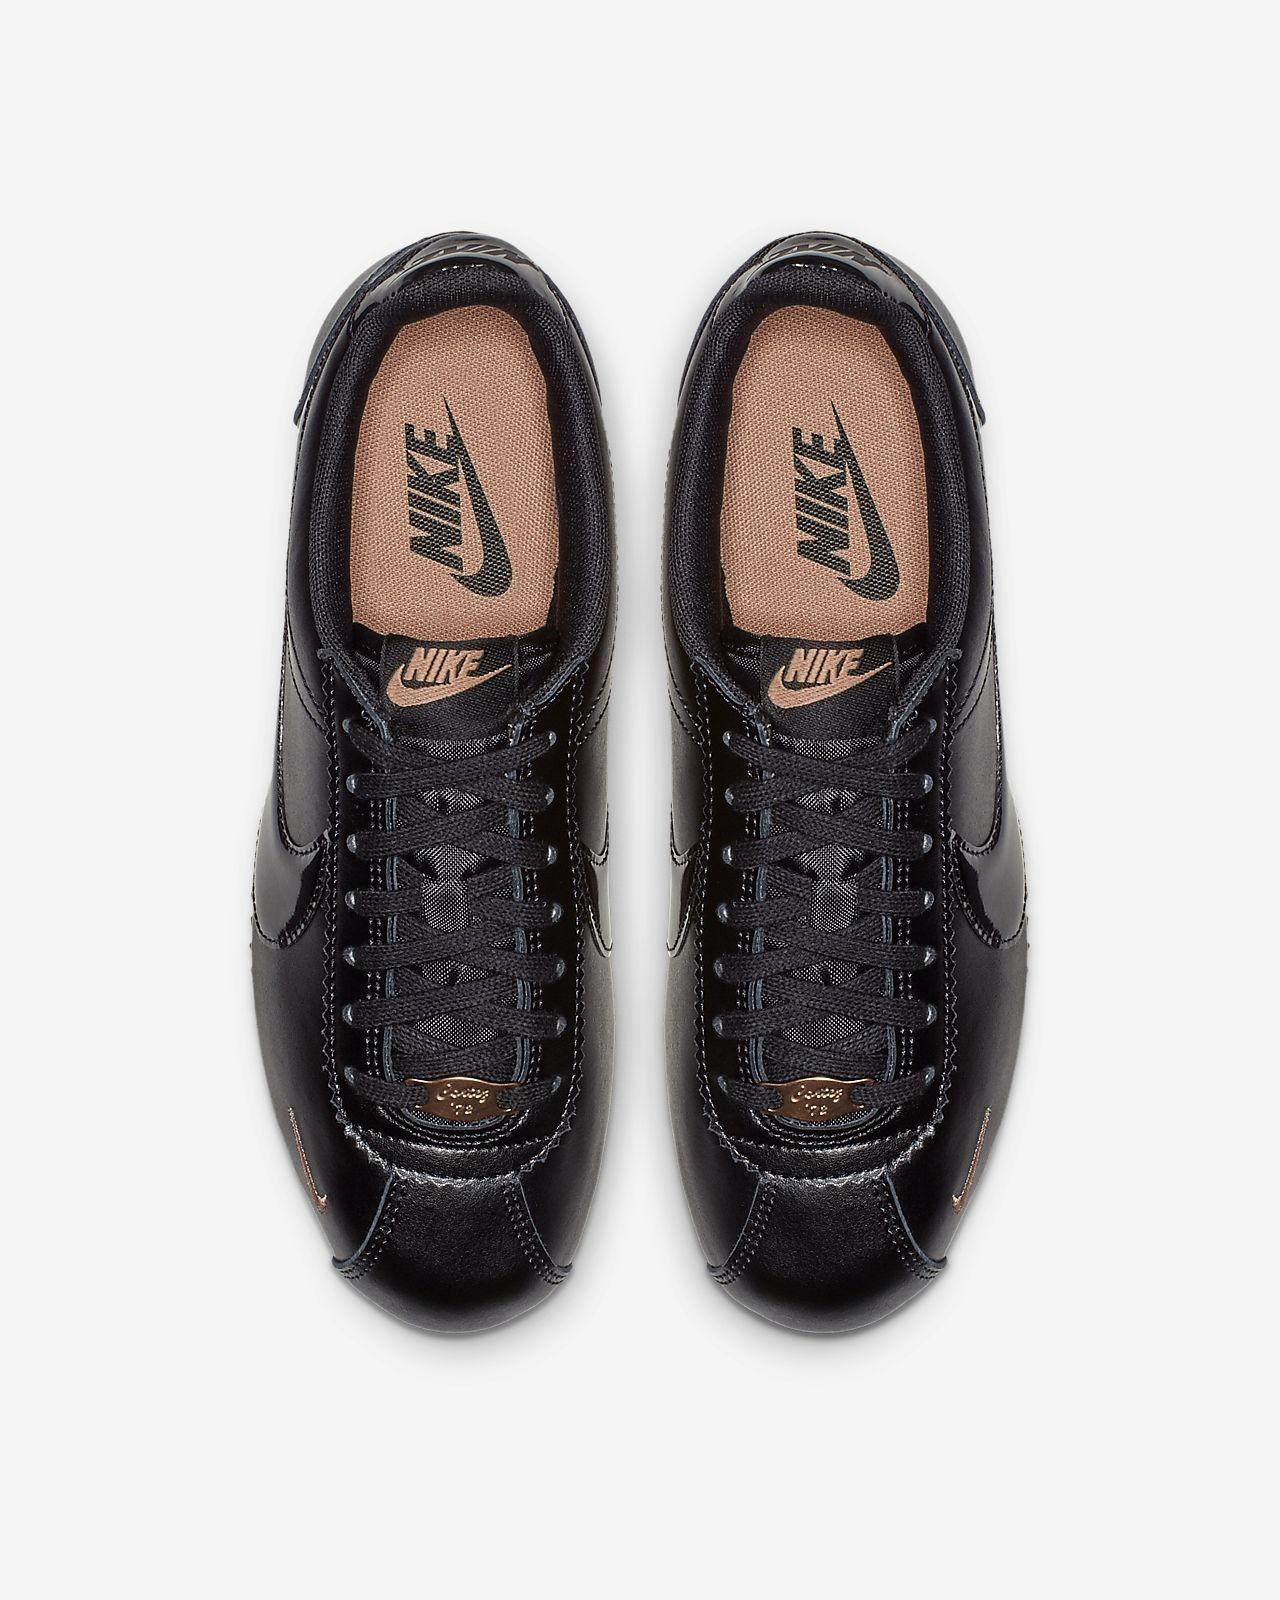 Nike Classic Cortez Premium Women s Shoe. Nike.com IE 695caa484